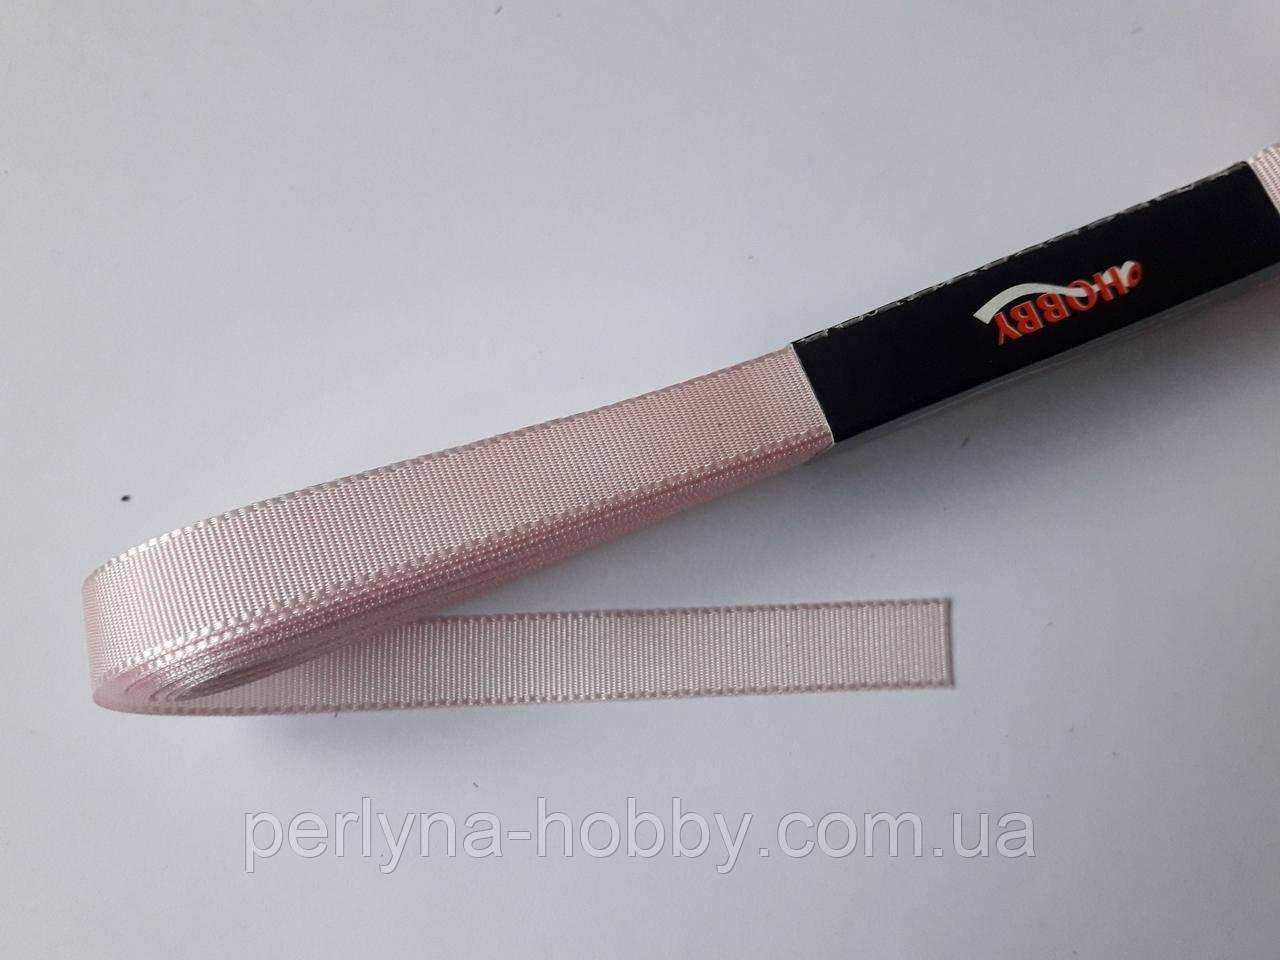 Стрічка репсова 1 см( 10 метрів) рожева пастельна